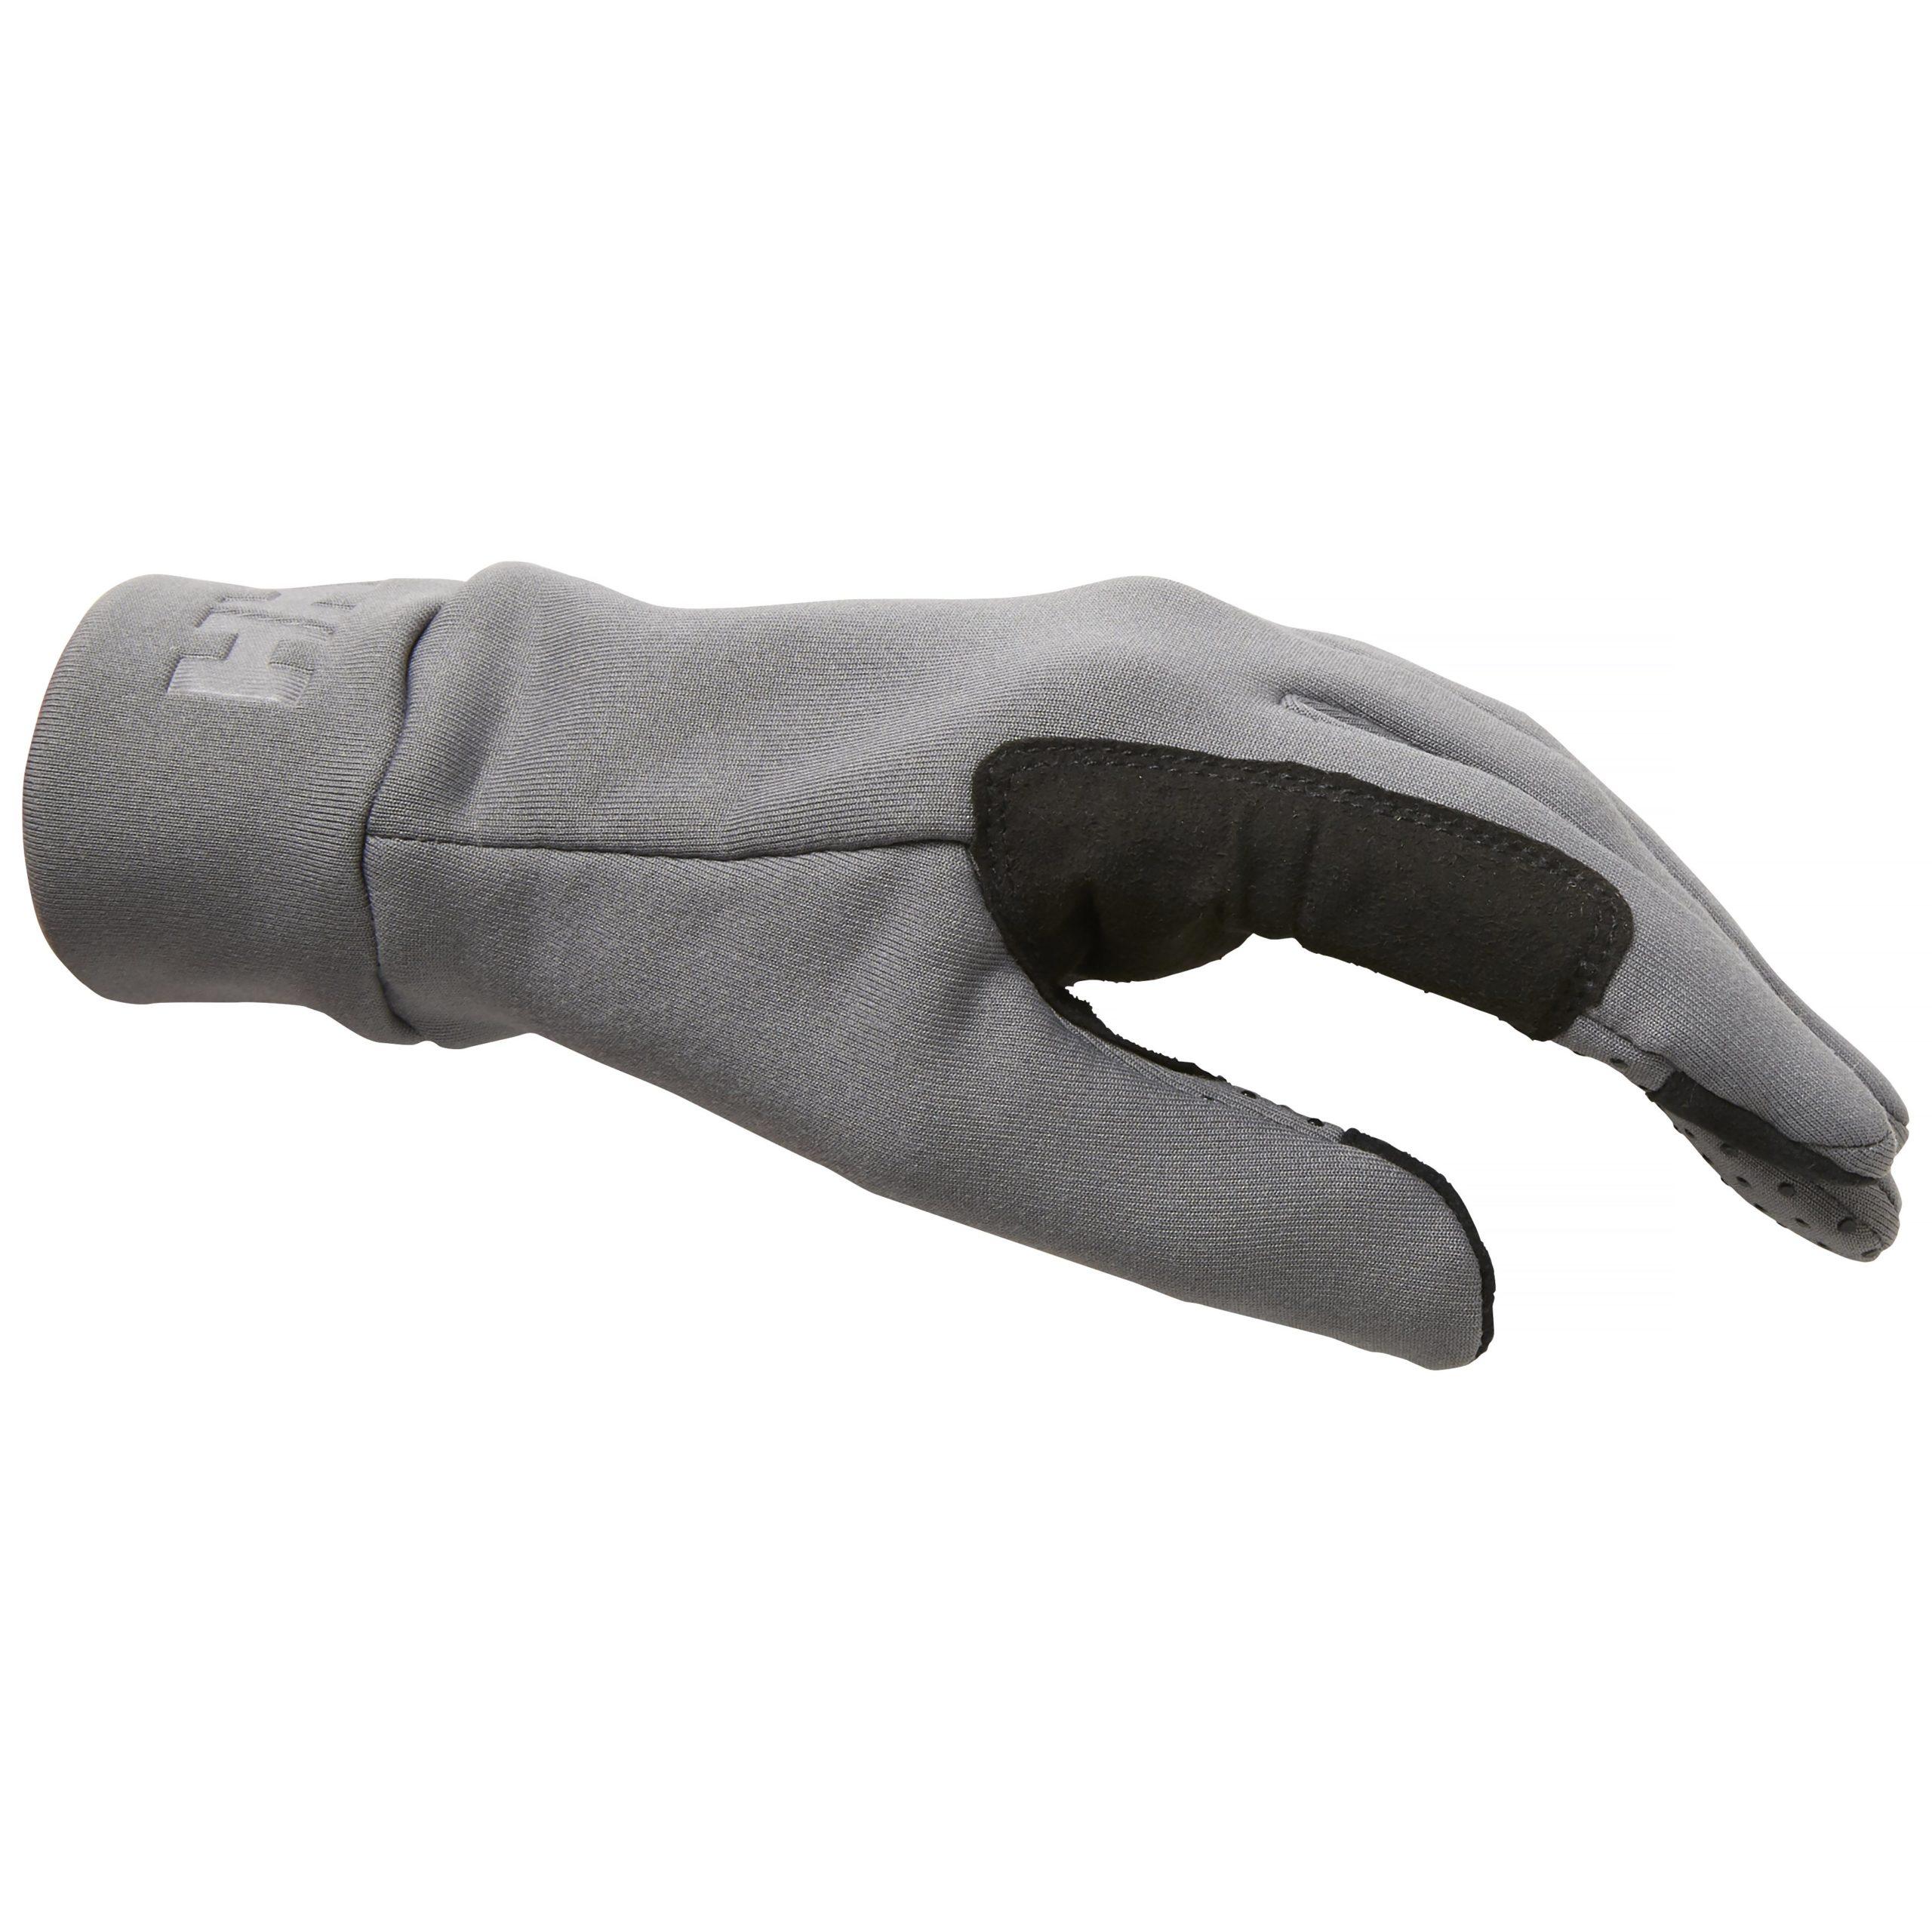 Adulto Helly Hansen Hh Fleece Touch Liner Guanti Unisex